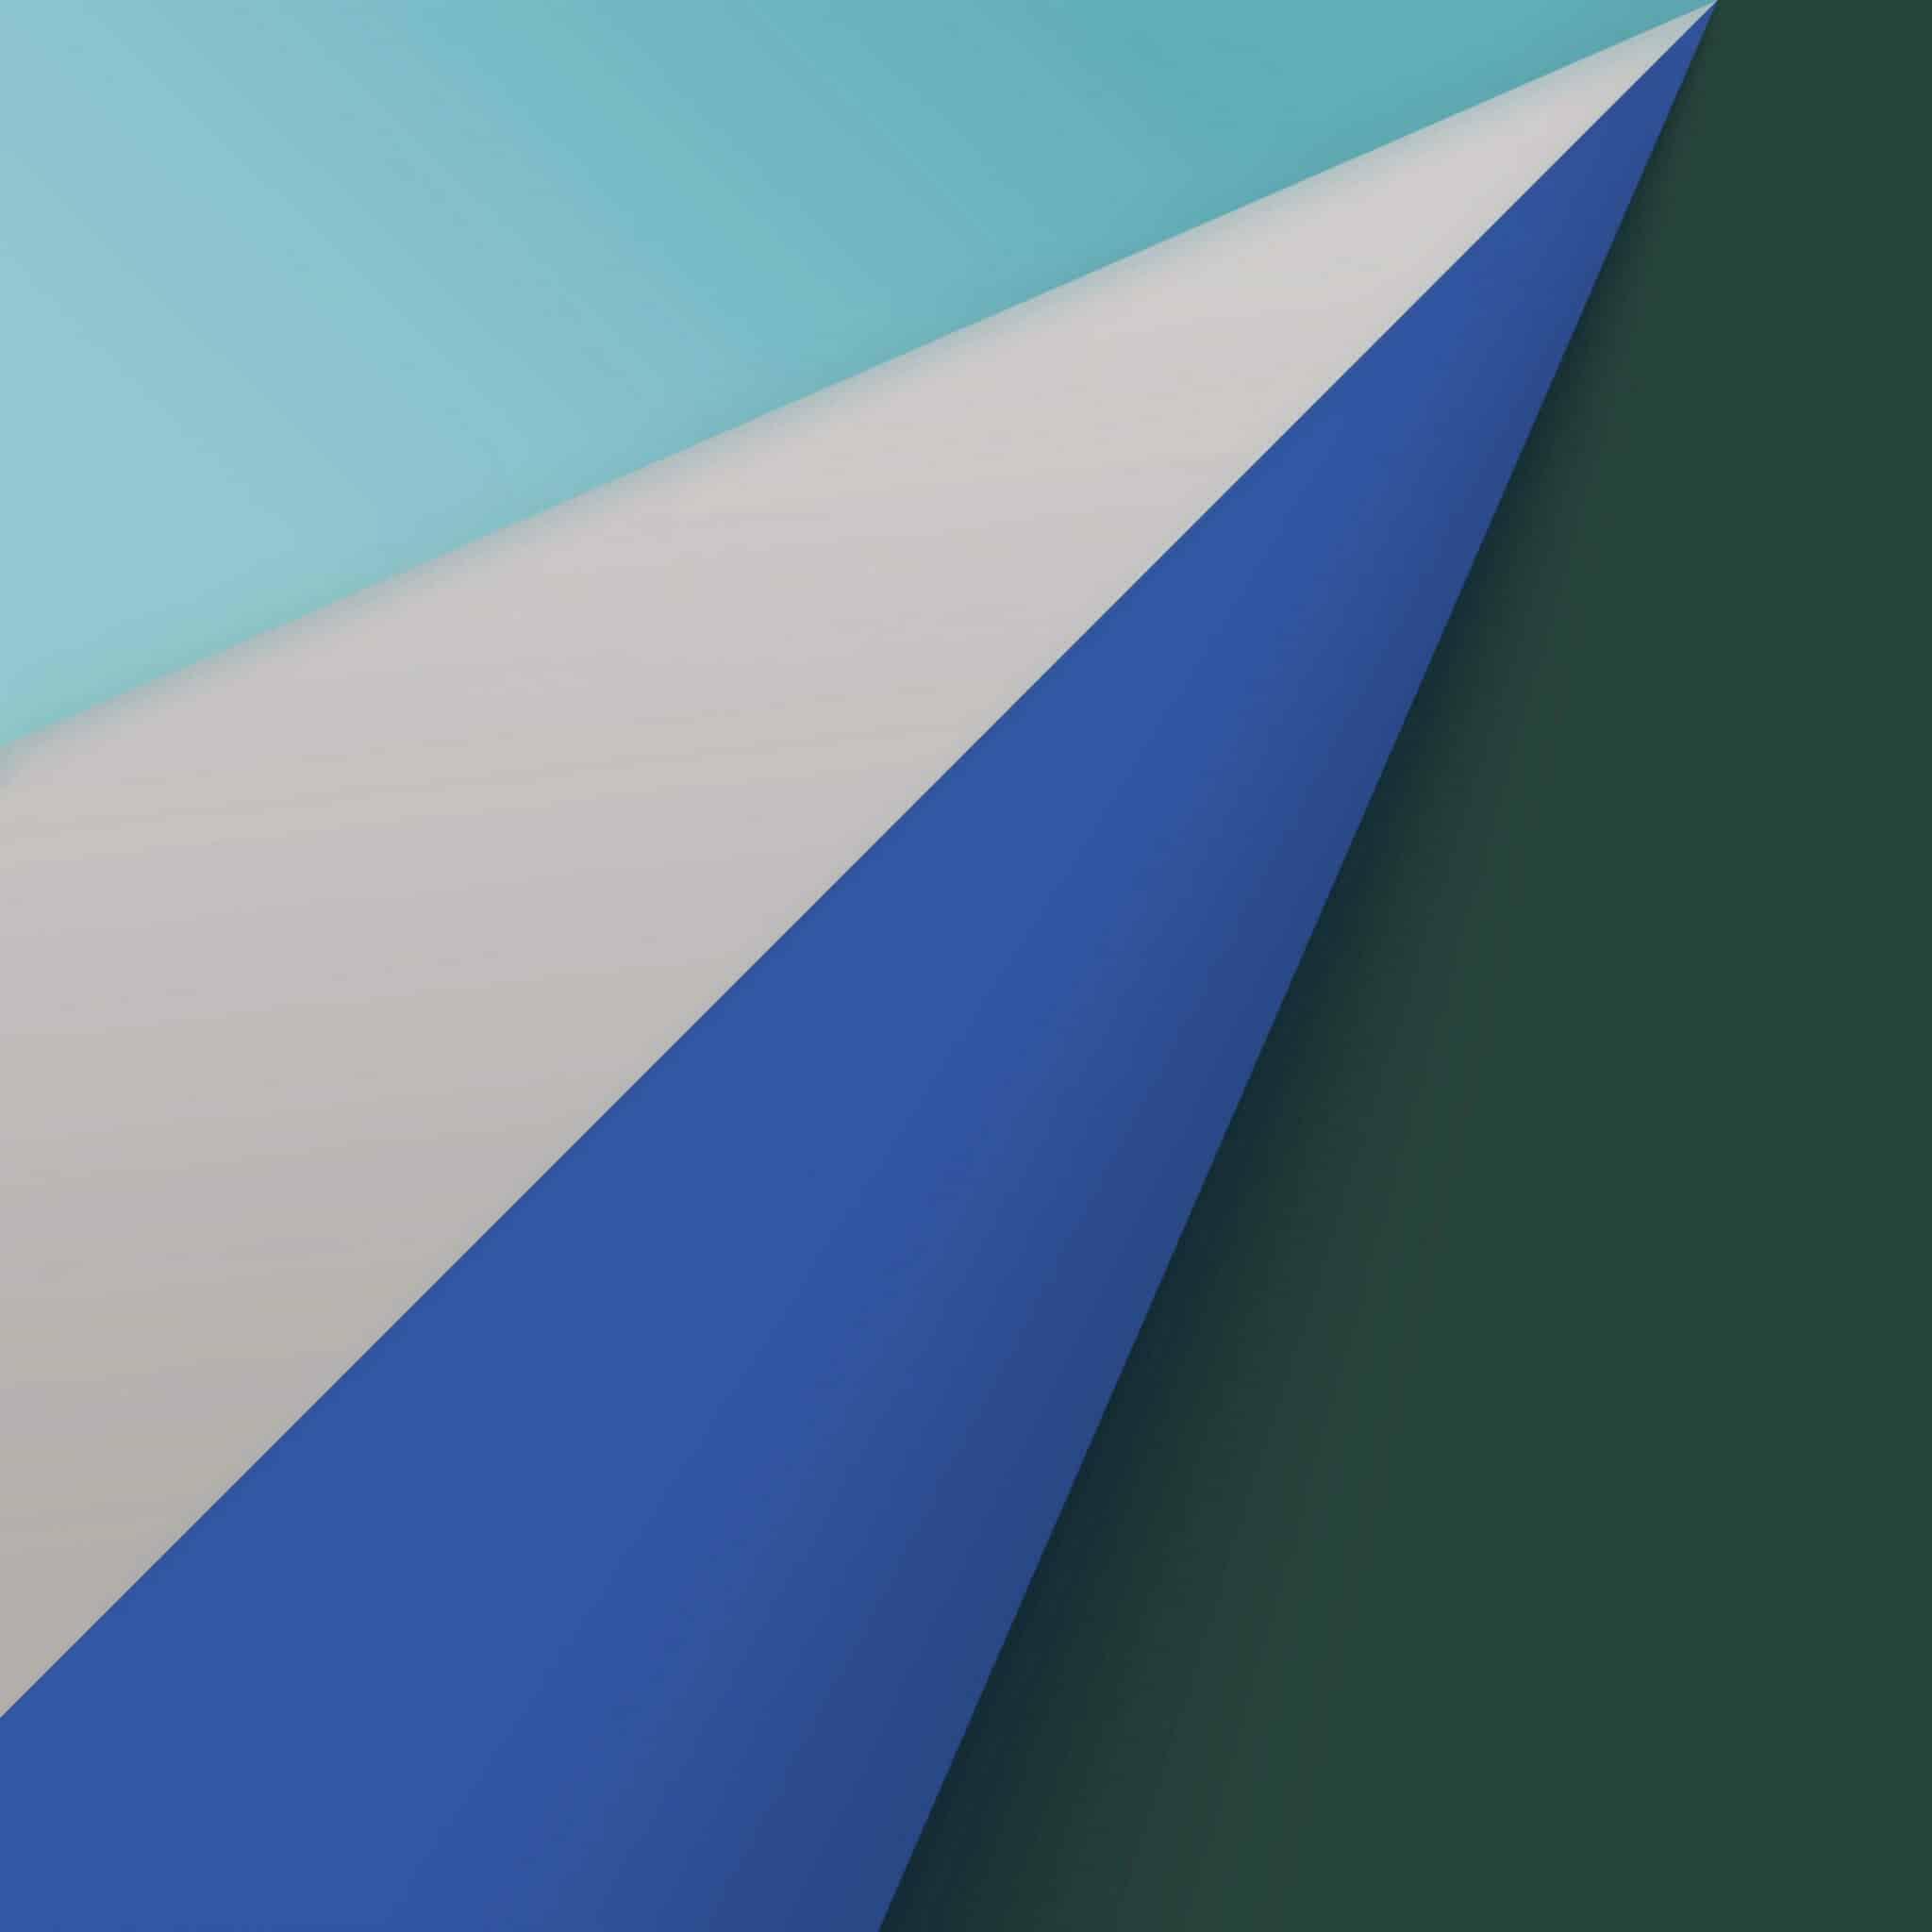 safari background blue wallpaper